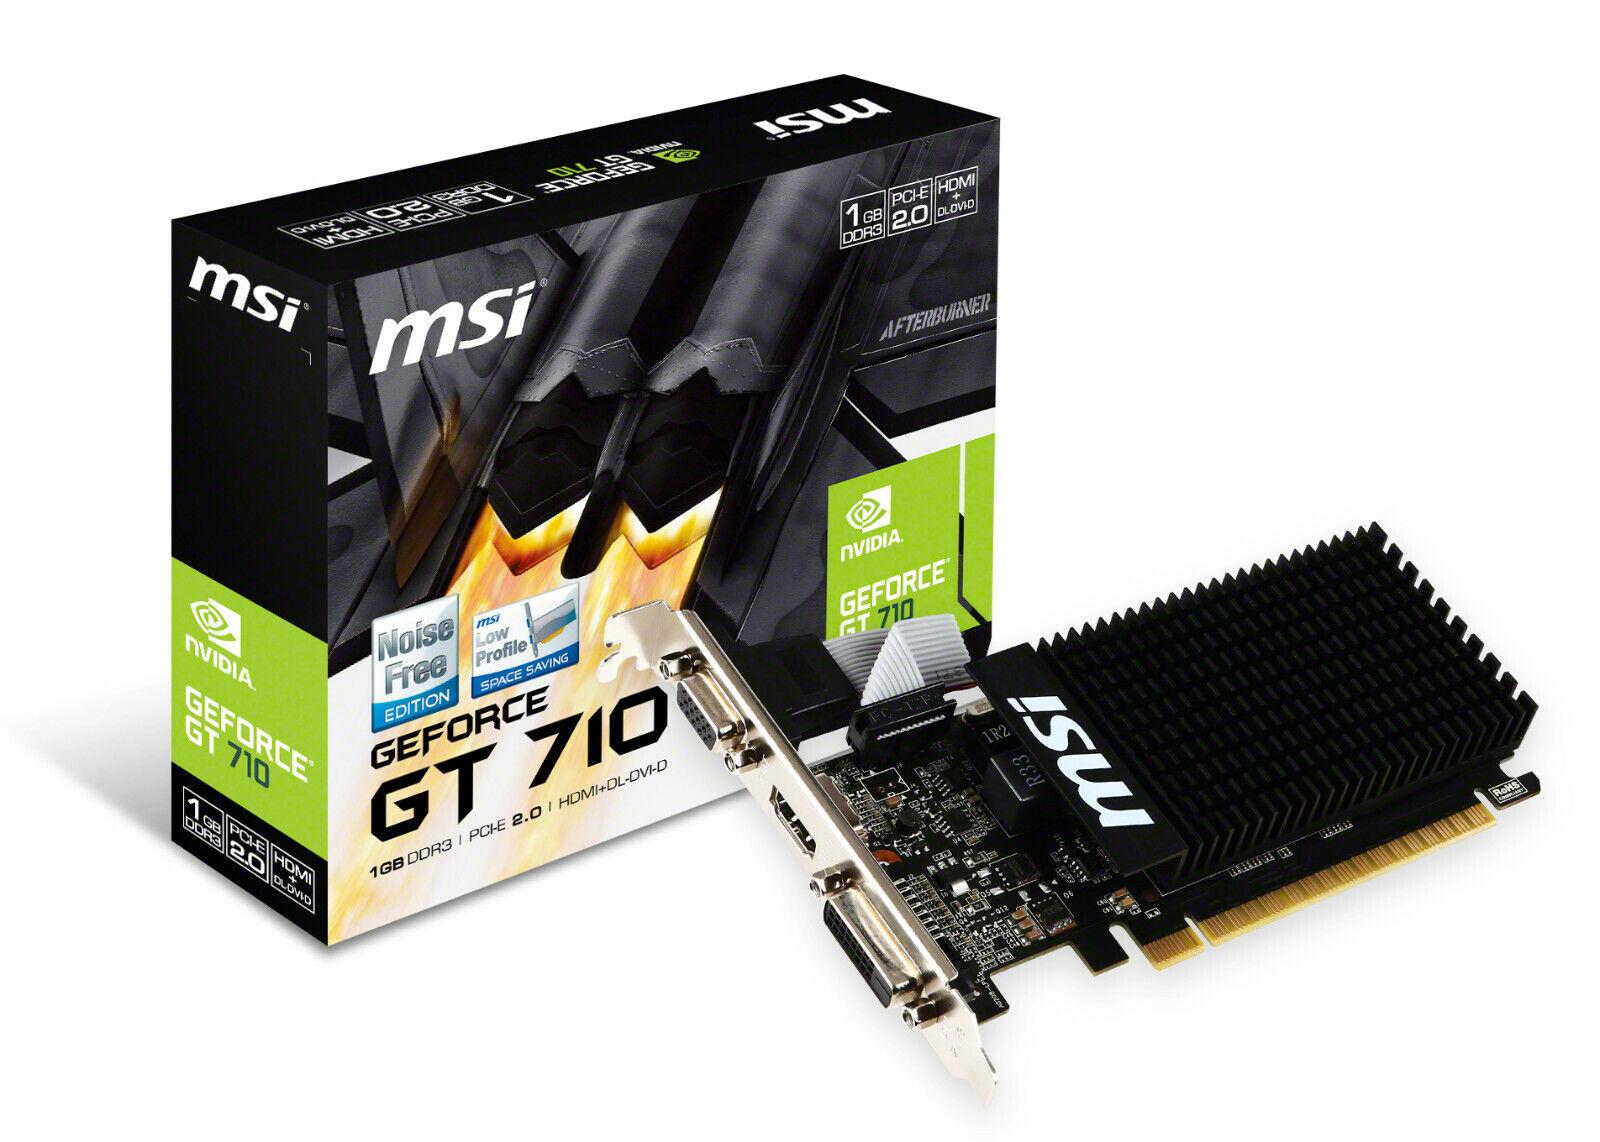 MSI ~~ GeForce GT 710 ~~ 1 GB GDDR3 ~~ PCIe 2.0 x16 HDMI+DVI+VGA Grafikkarte PAS